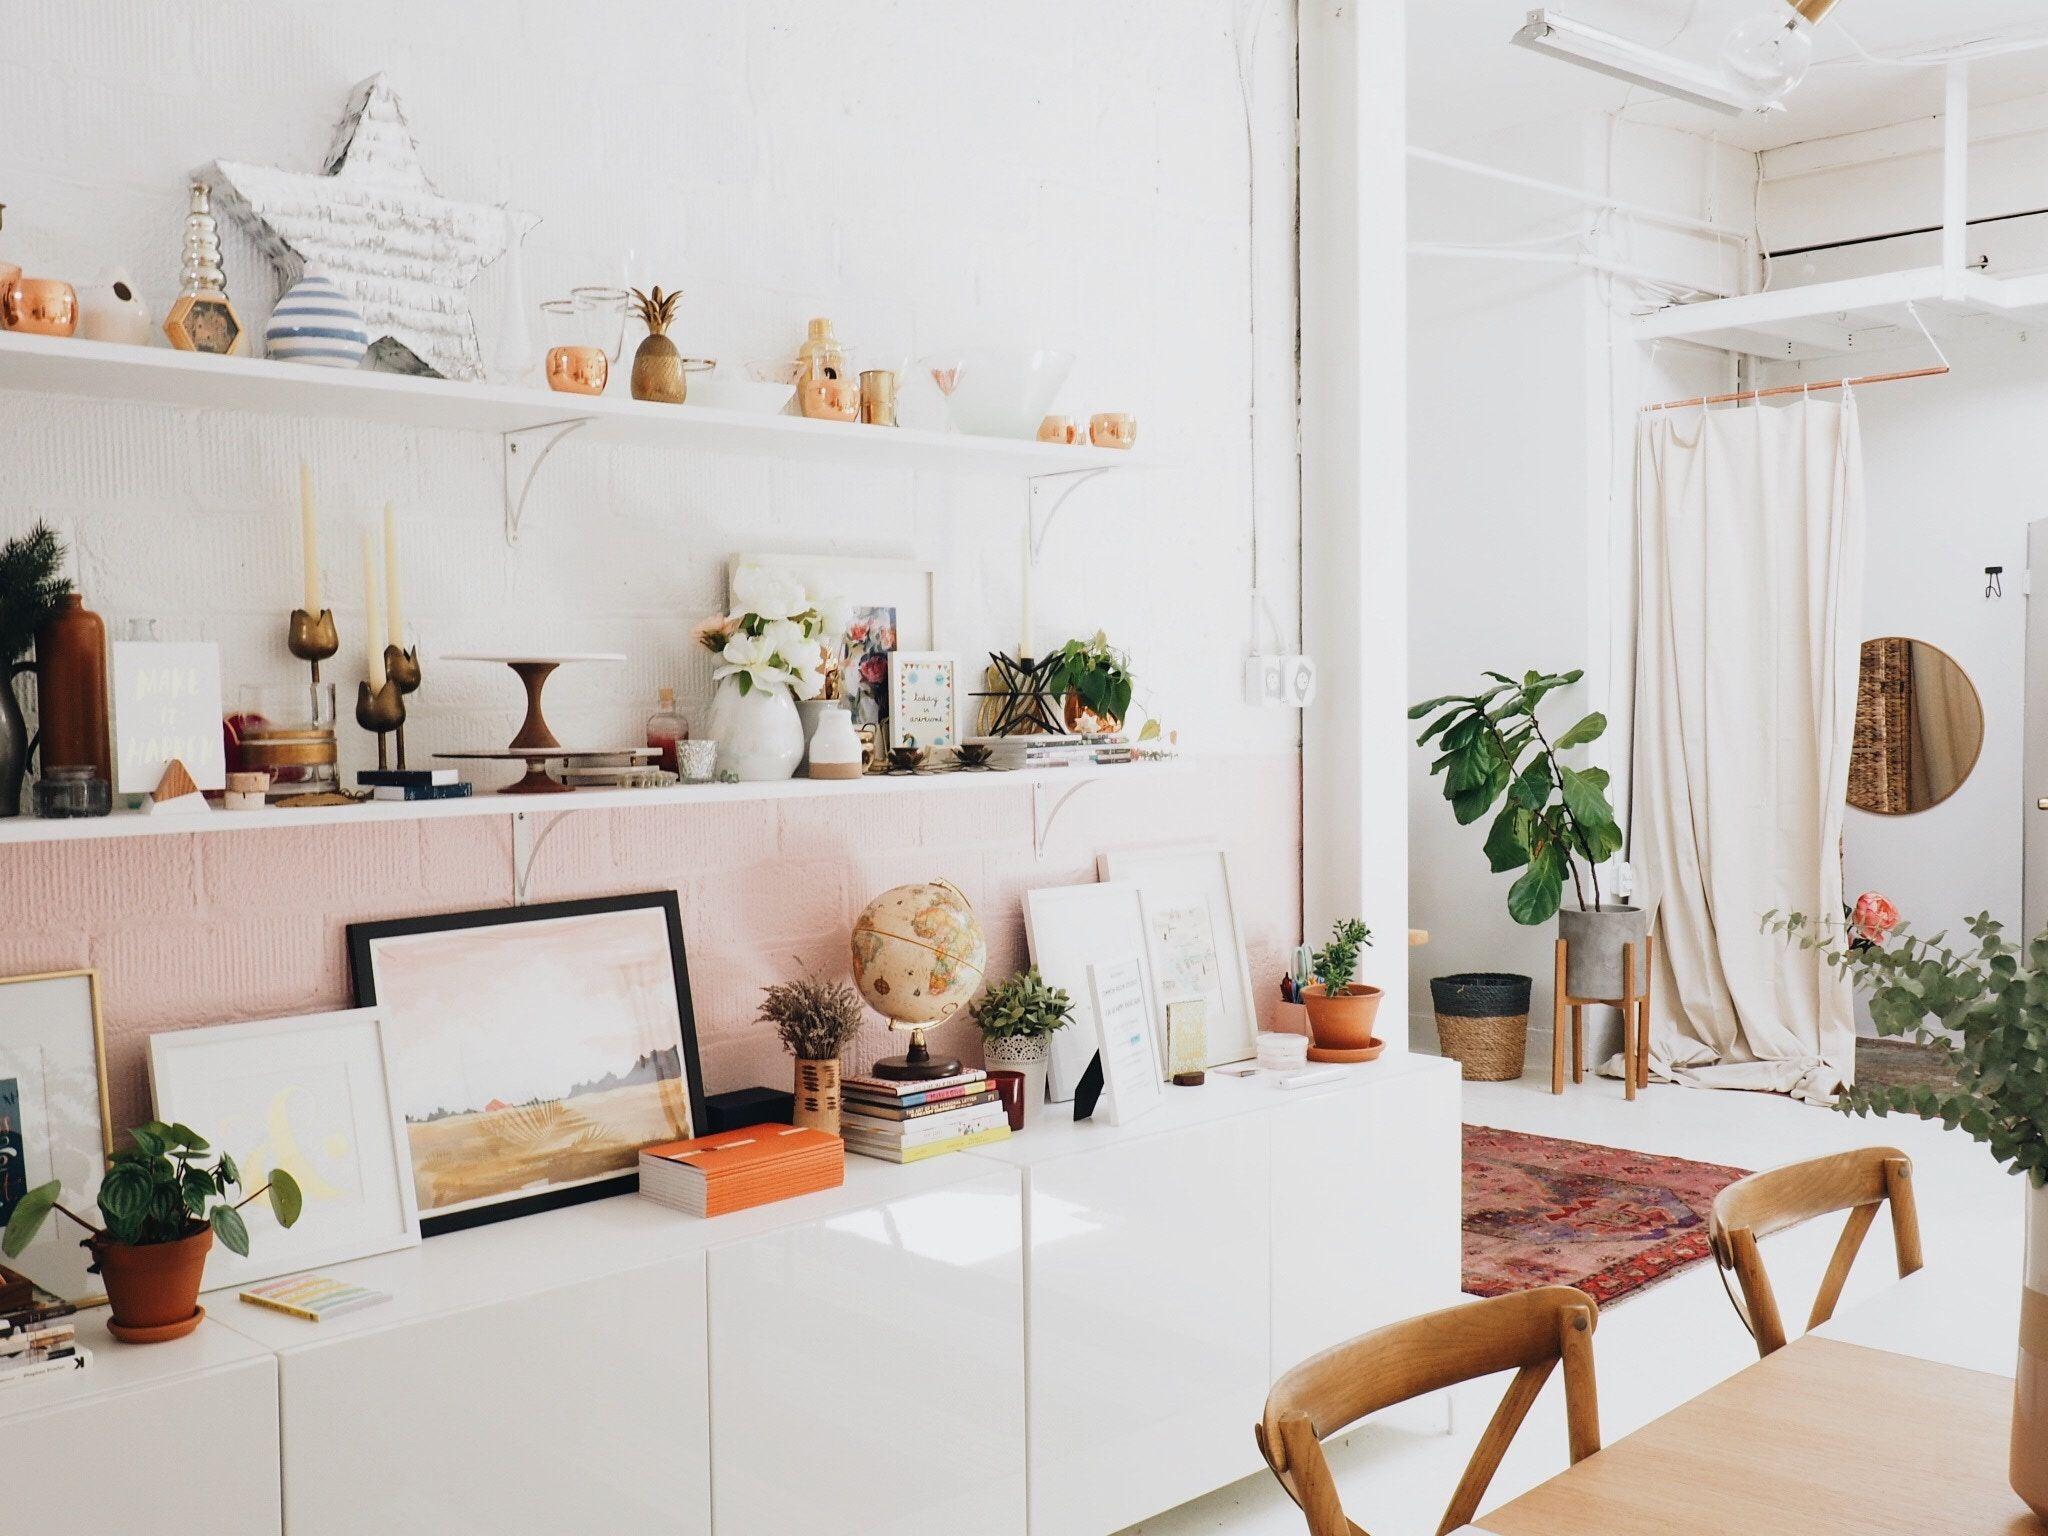 Modern Vintage Interior Design Ideas For Your Home Decor House